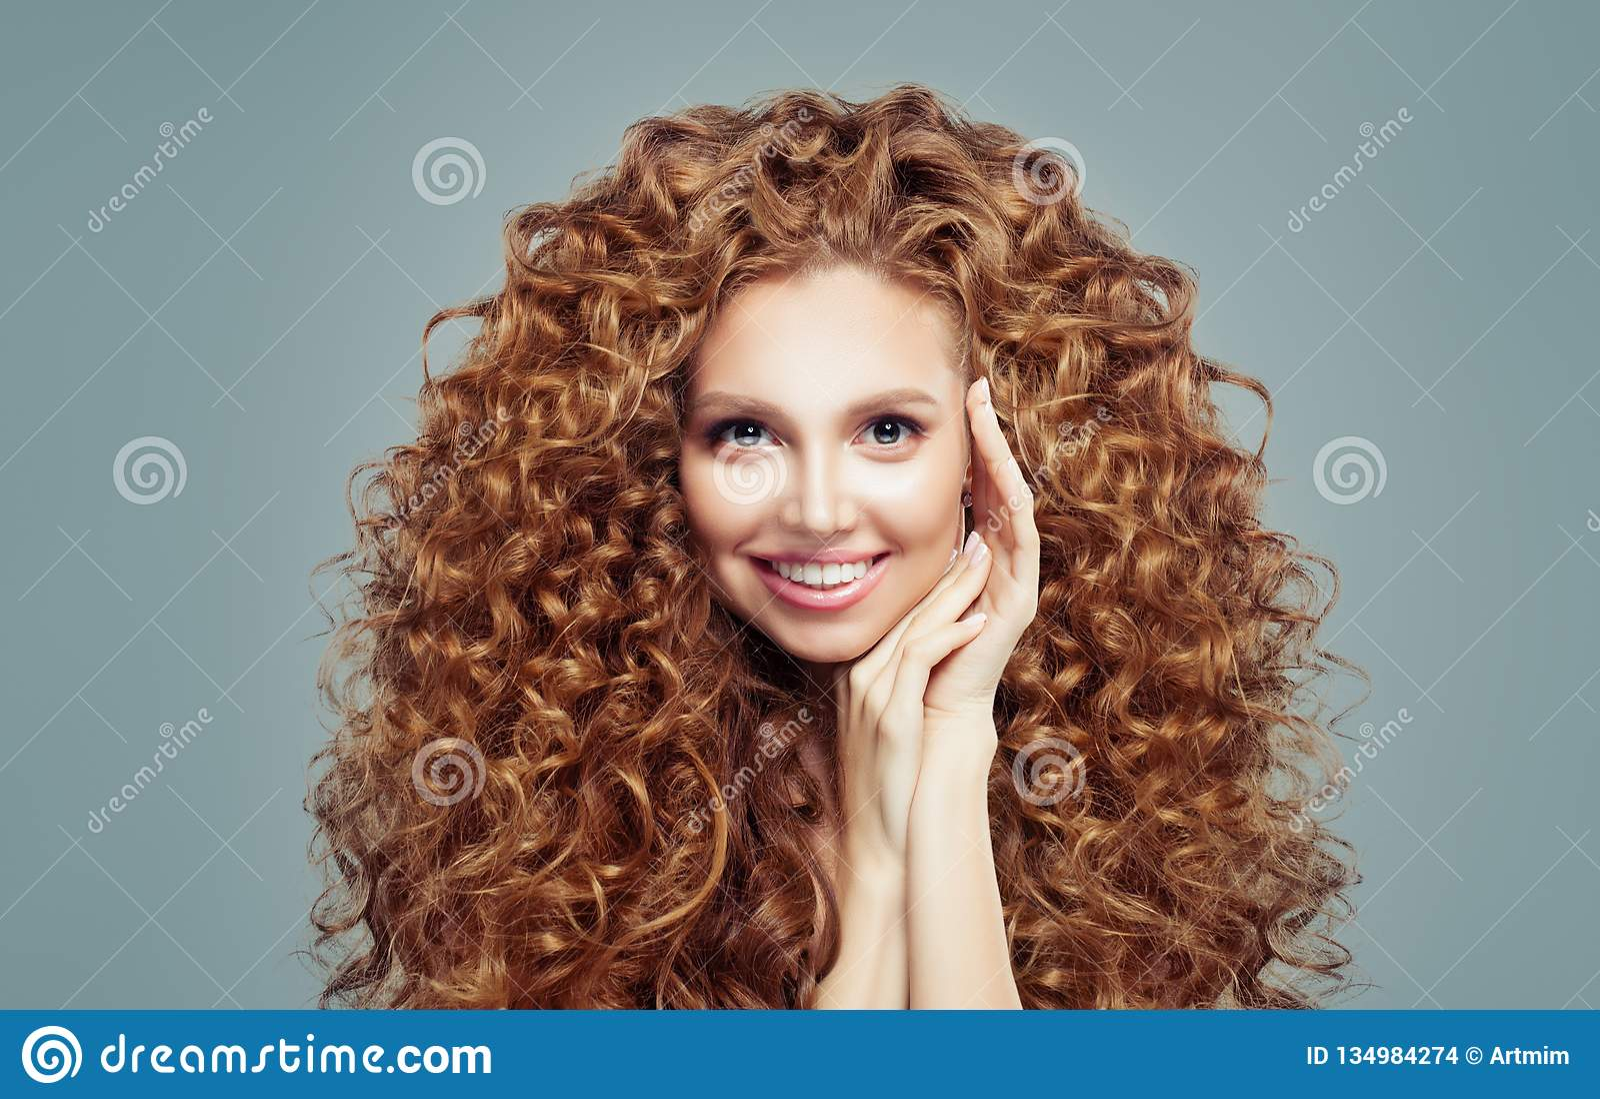 Redhead hair care apologise